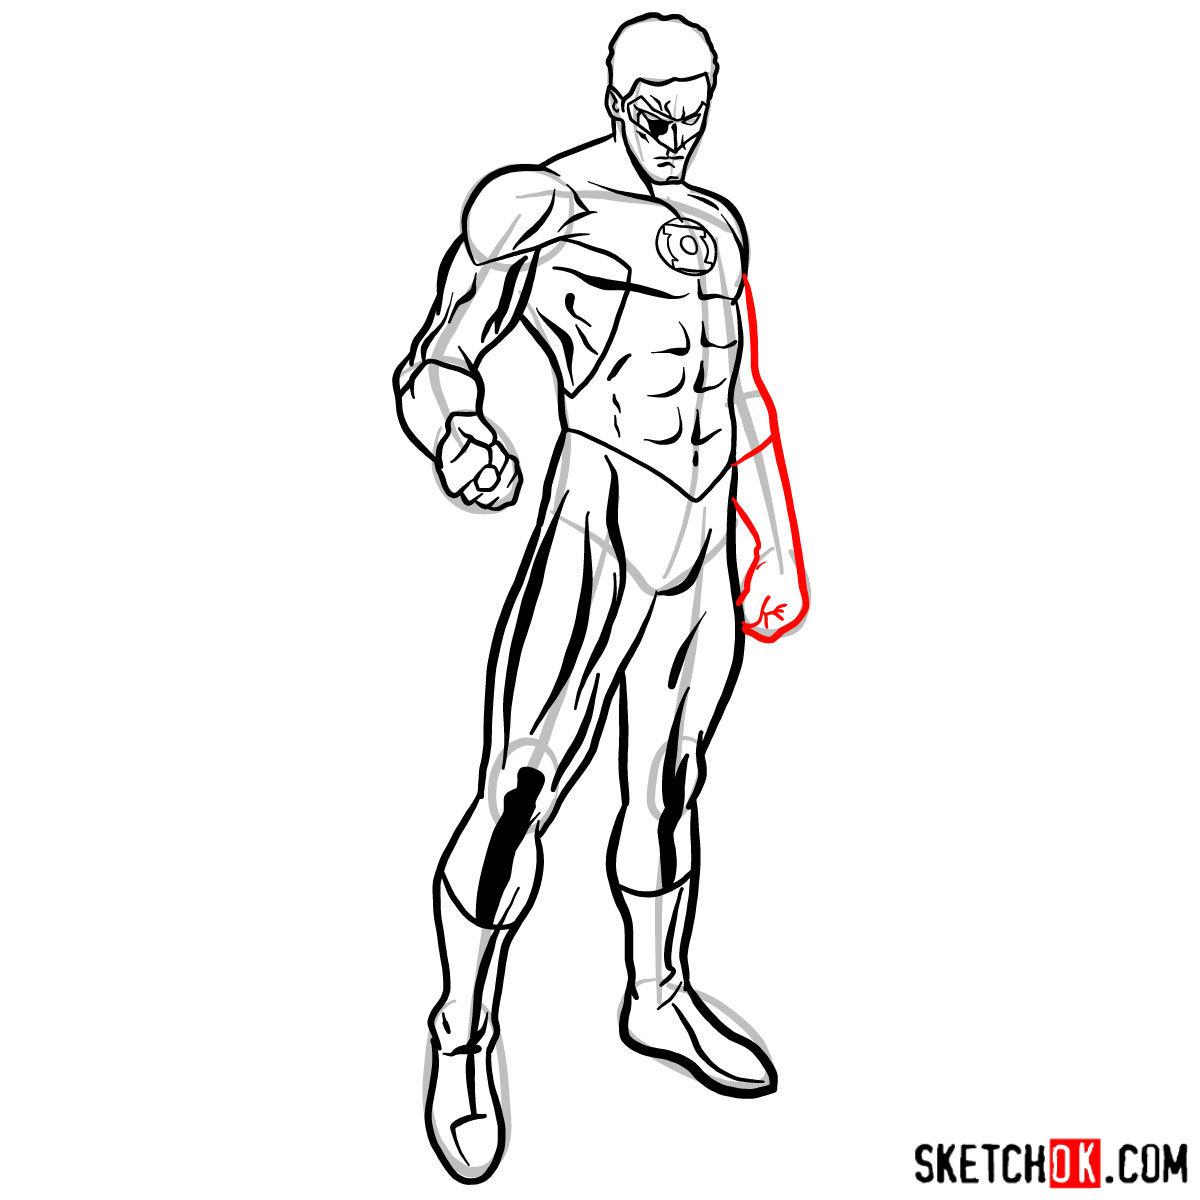 1200x1200 How To Draw Hal Jordan As Green Lantern